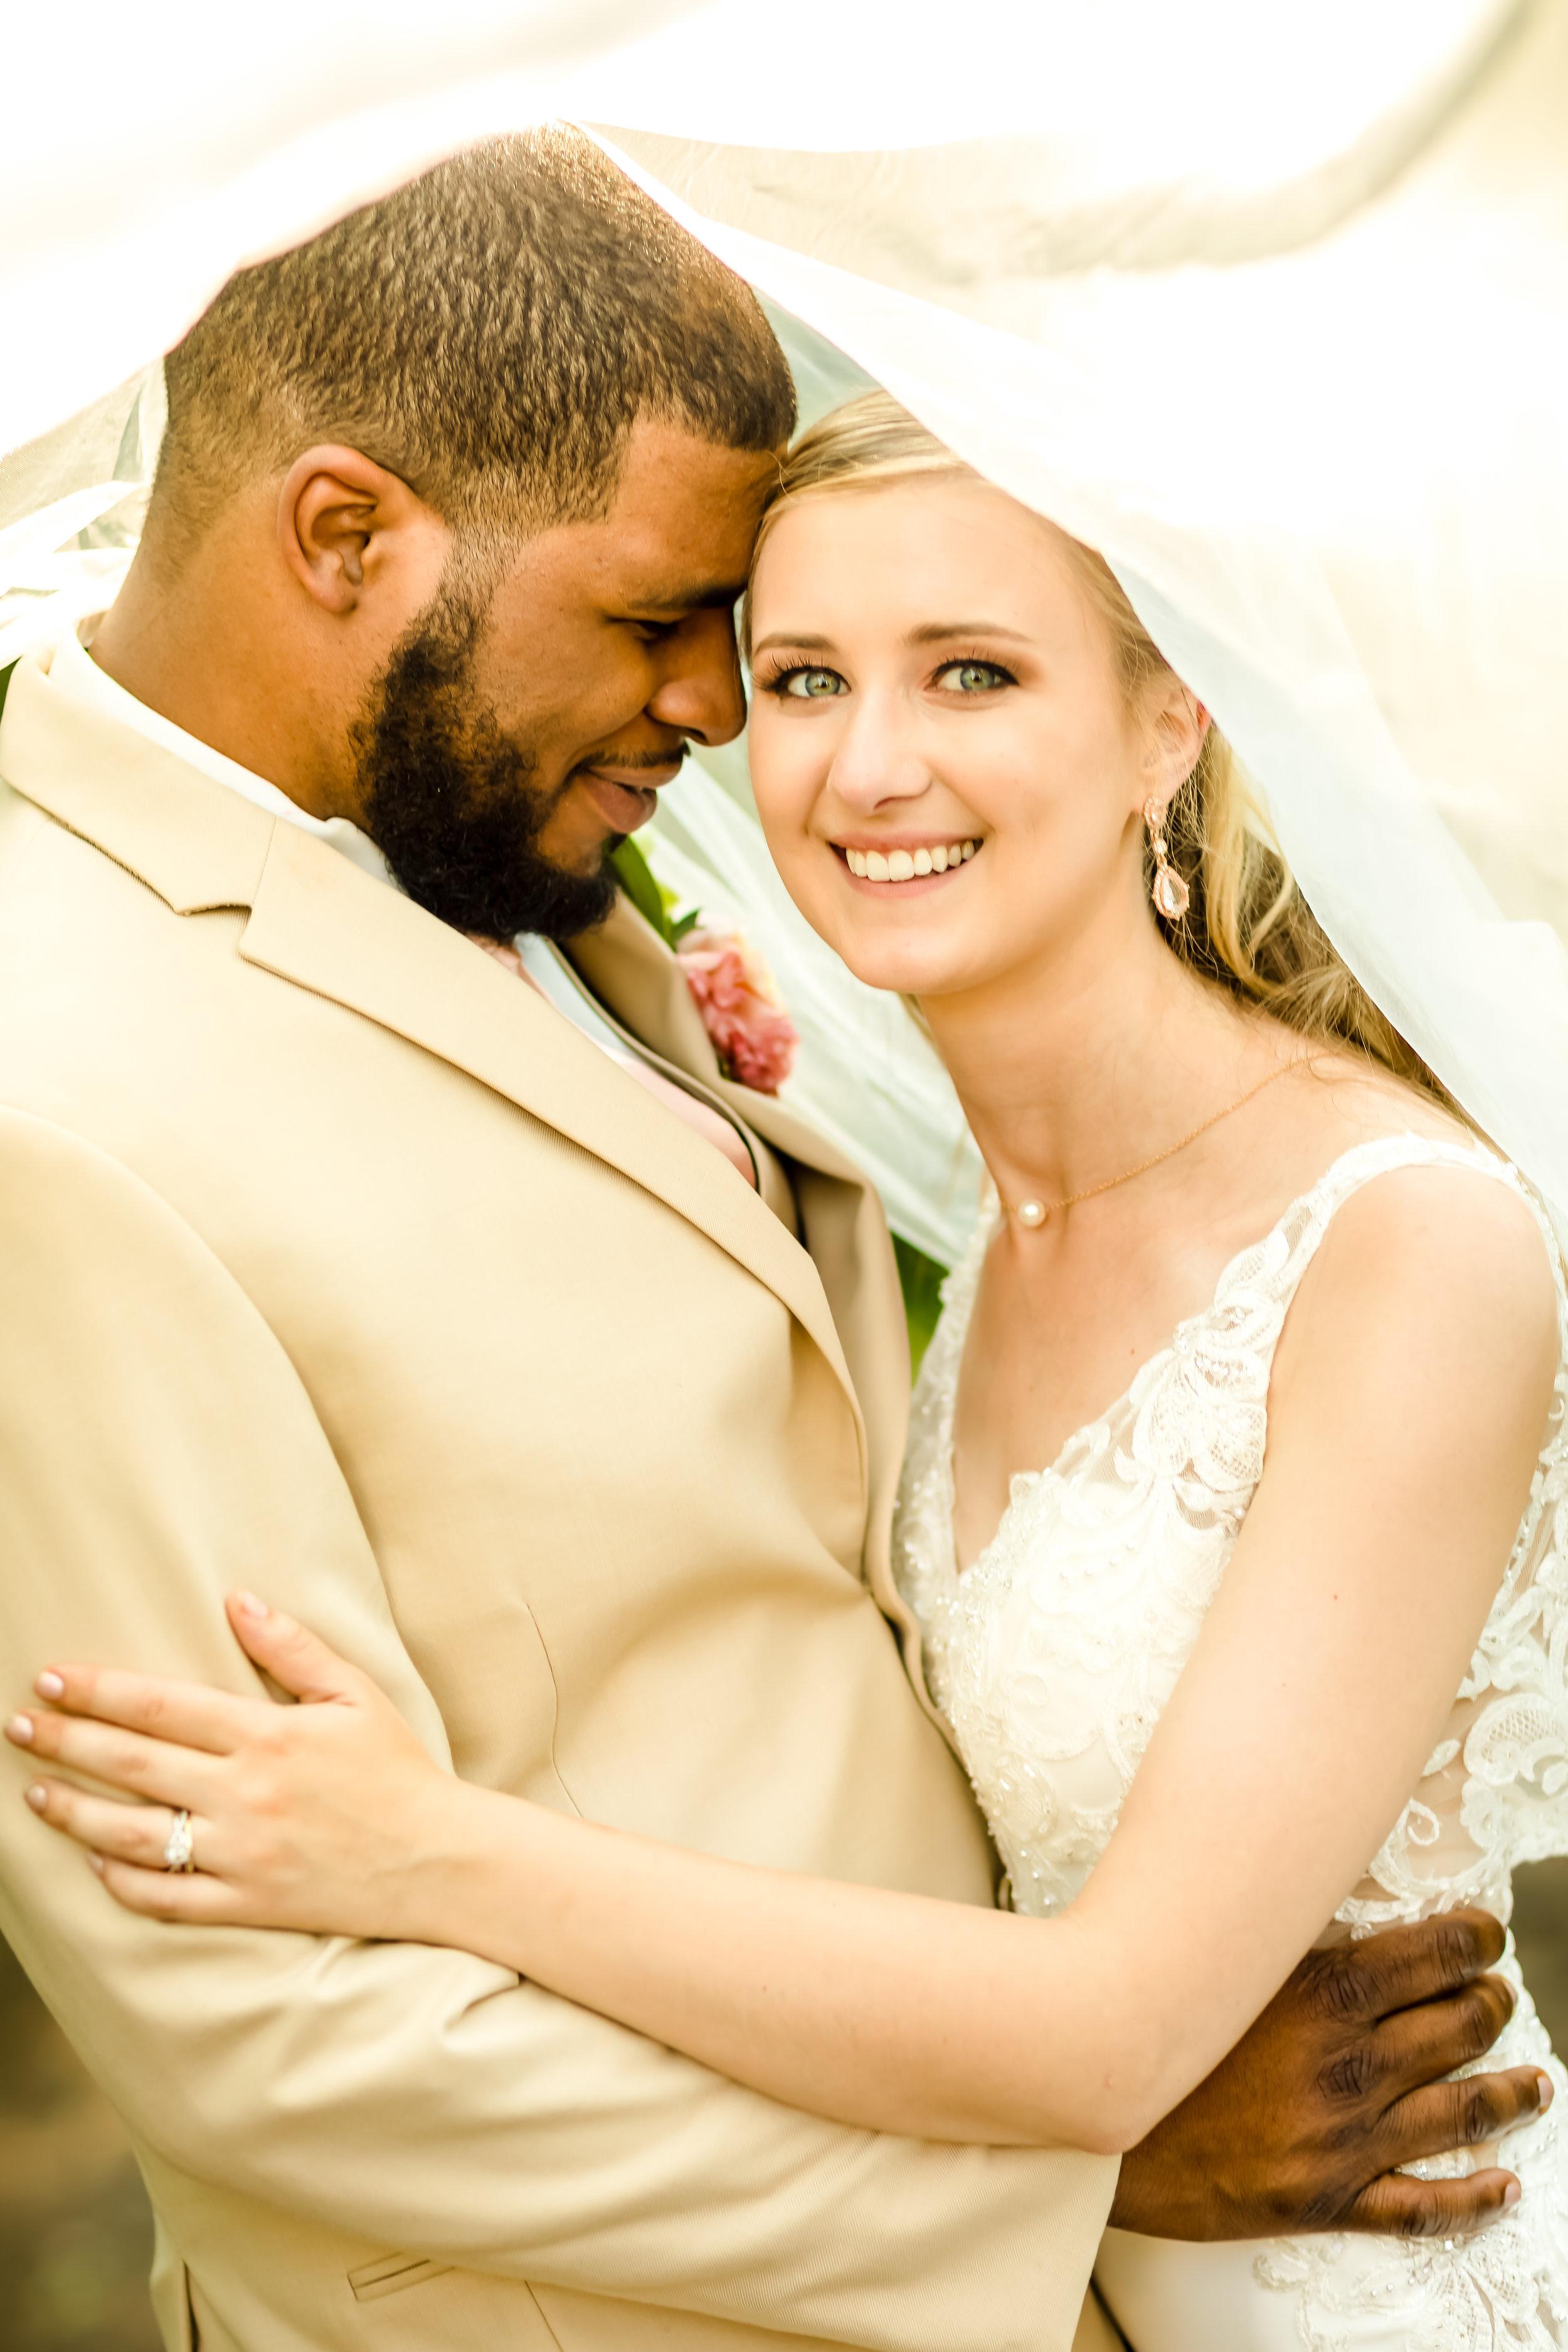 sarah_ikeem_wedding_at_the_parlour_at_manns_chapel_05.18.19-.jpg